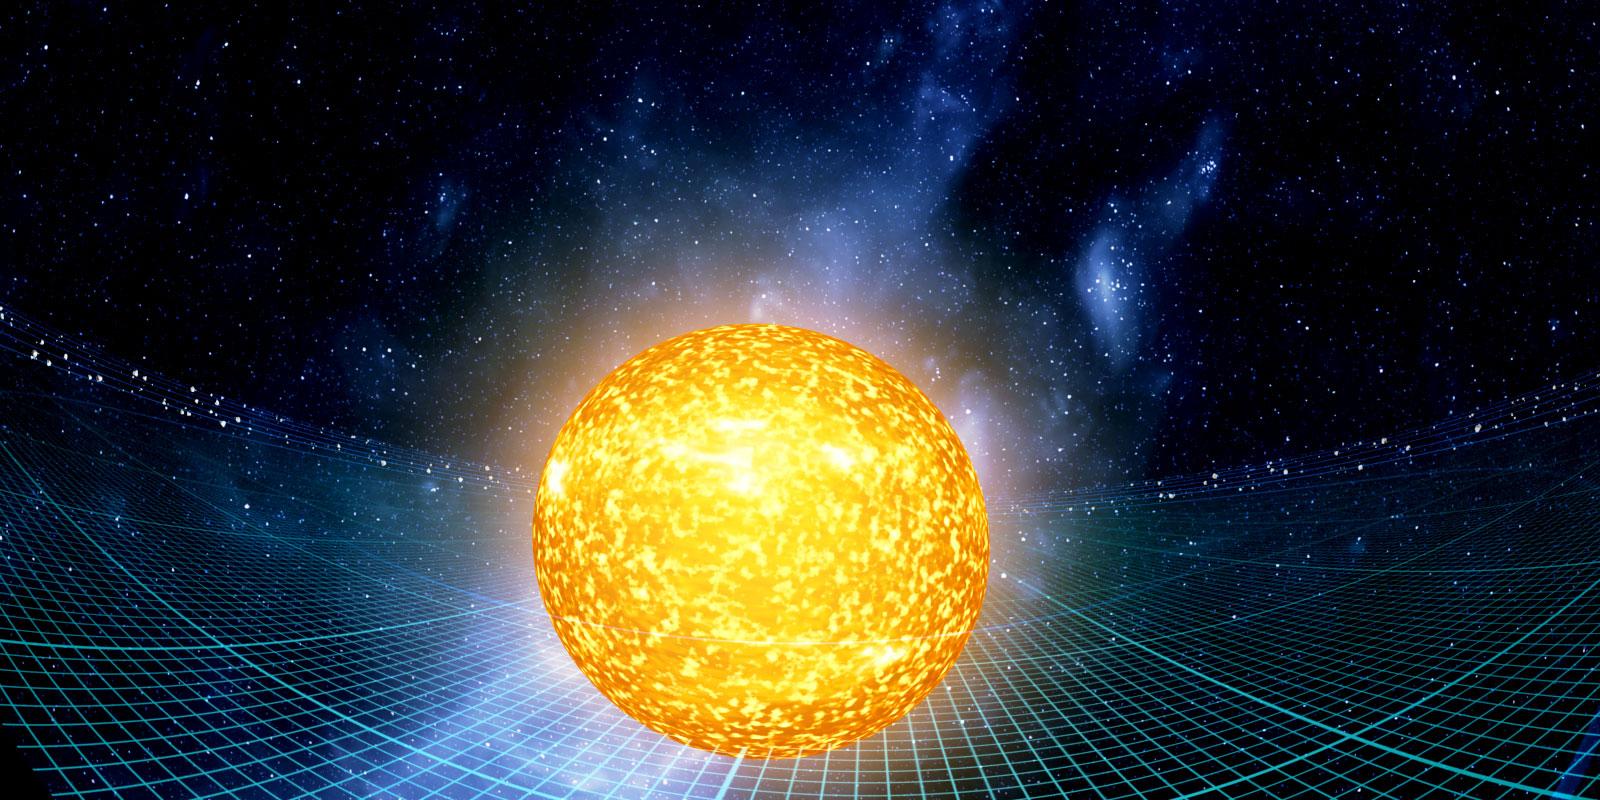 Remarkable white dwarf star possibly coldest, dimmest ever detected